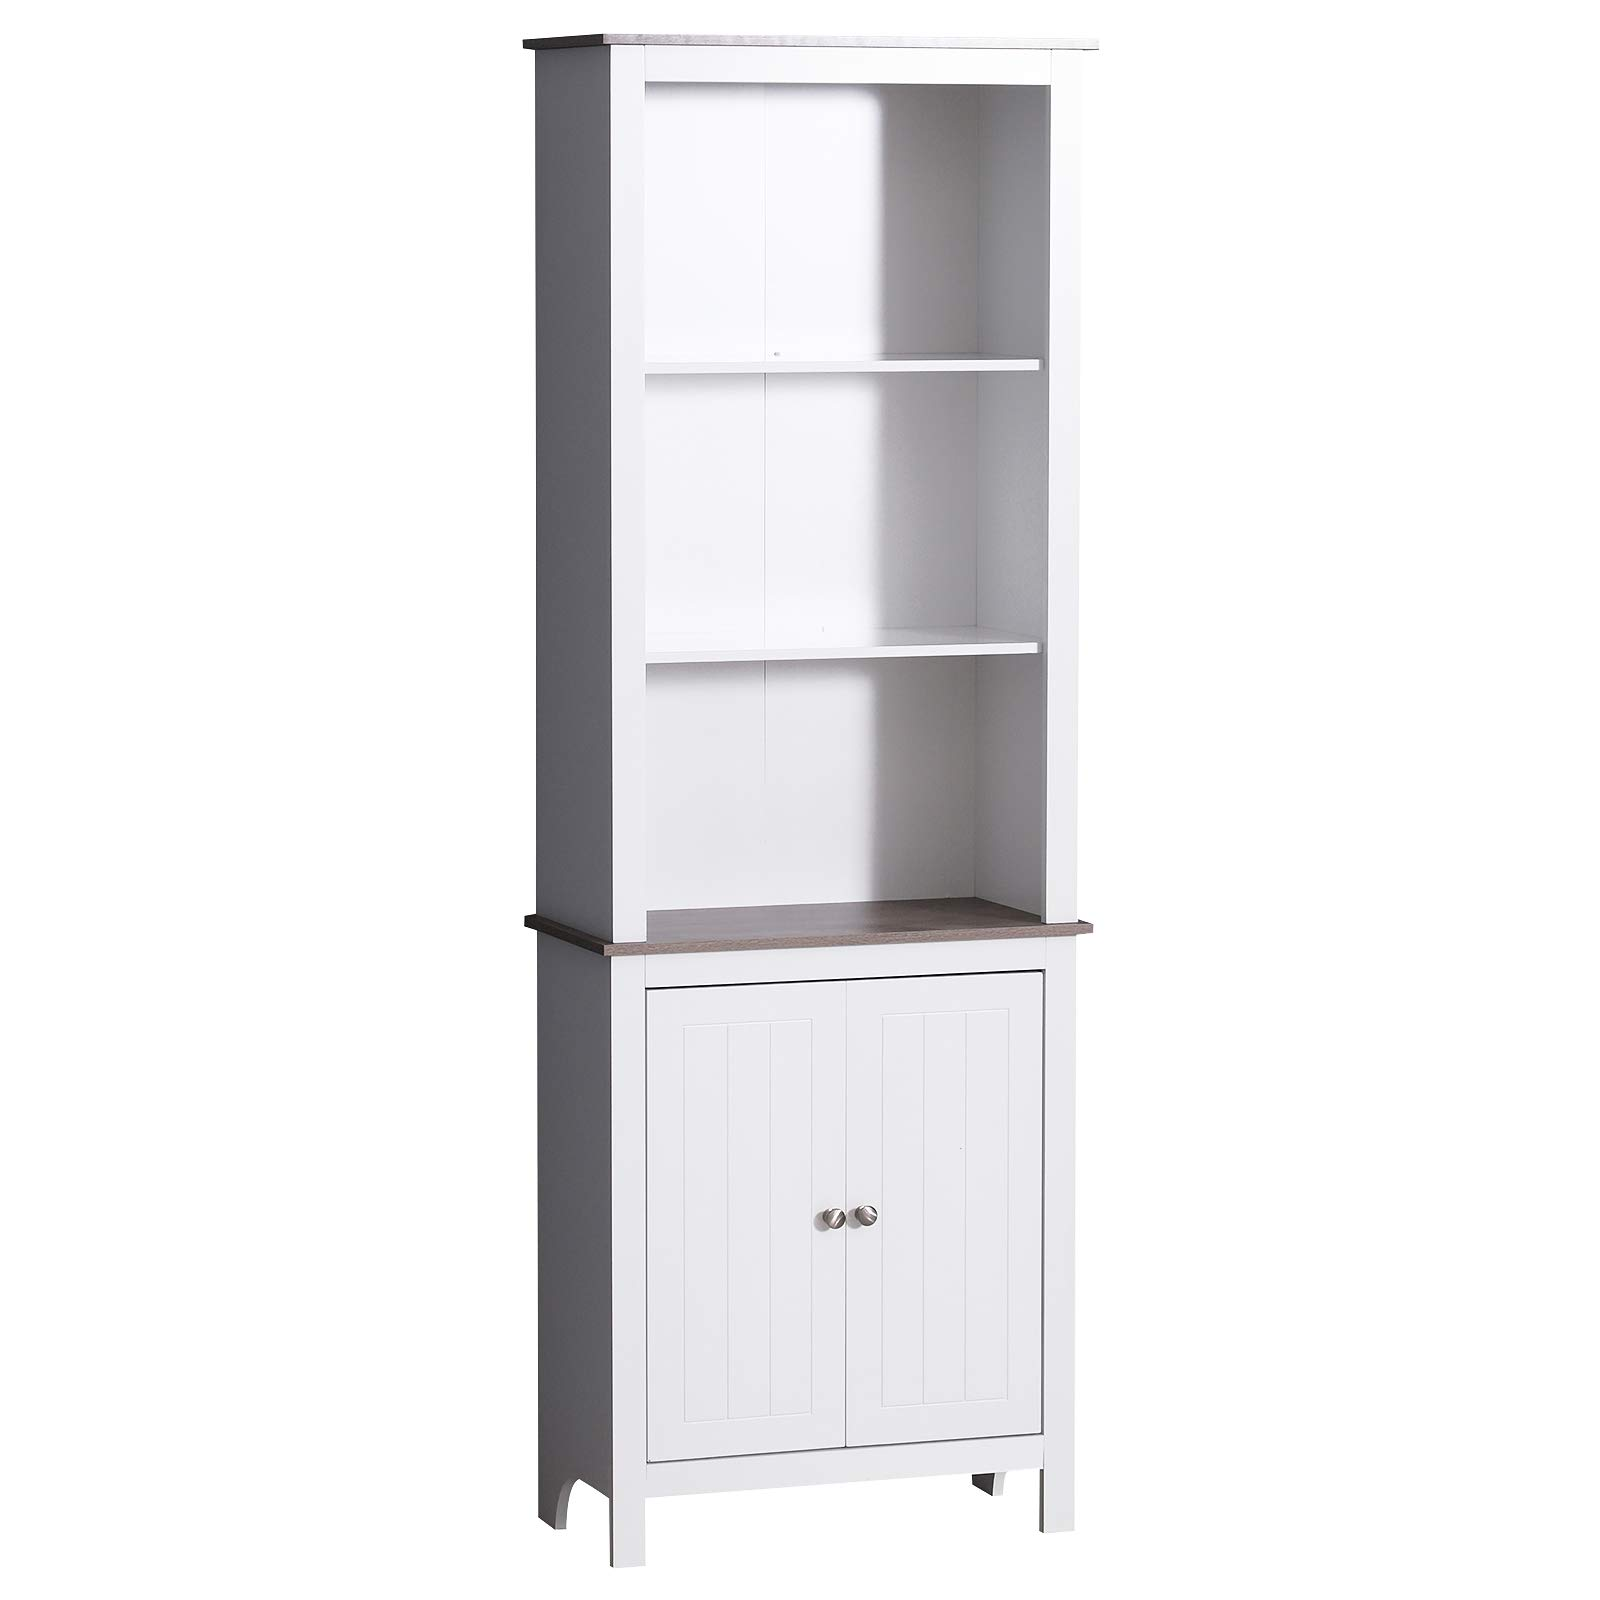 HOMCOM 69'' Wood Free Standing Bathroom Linen Tower Storage Cabinet - White by HOMCOM